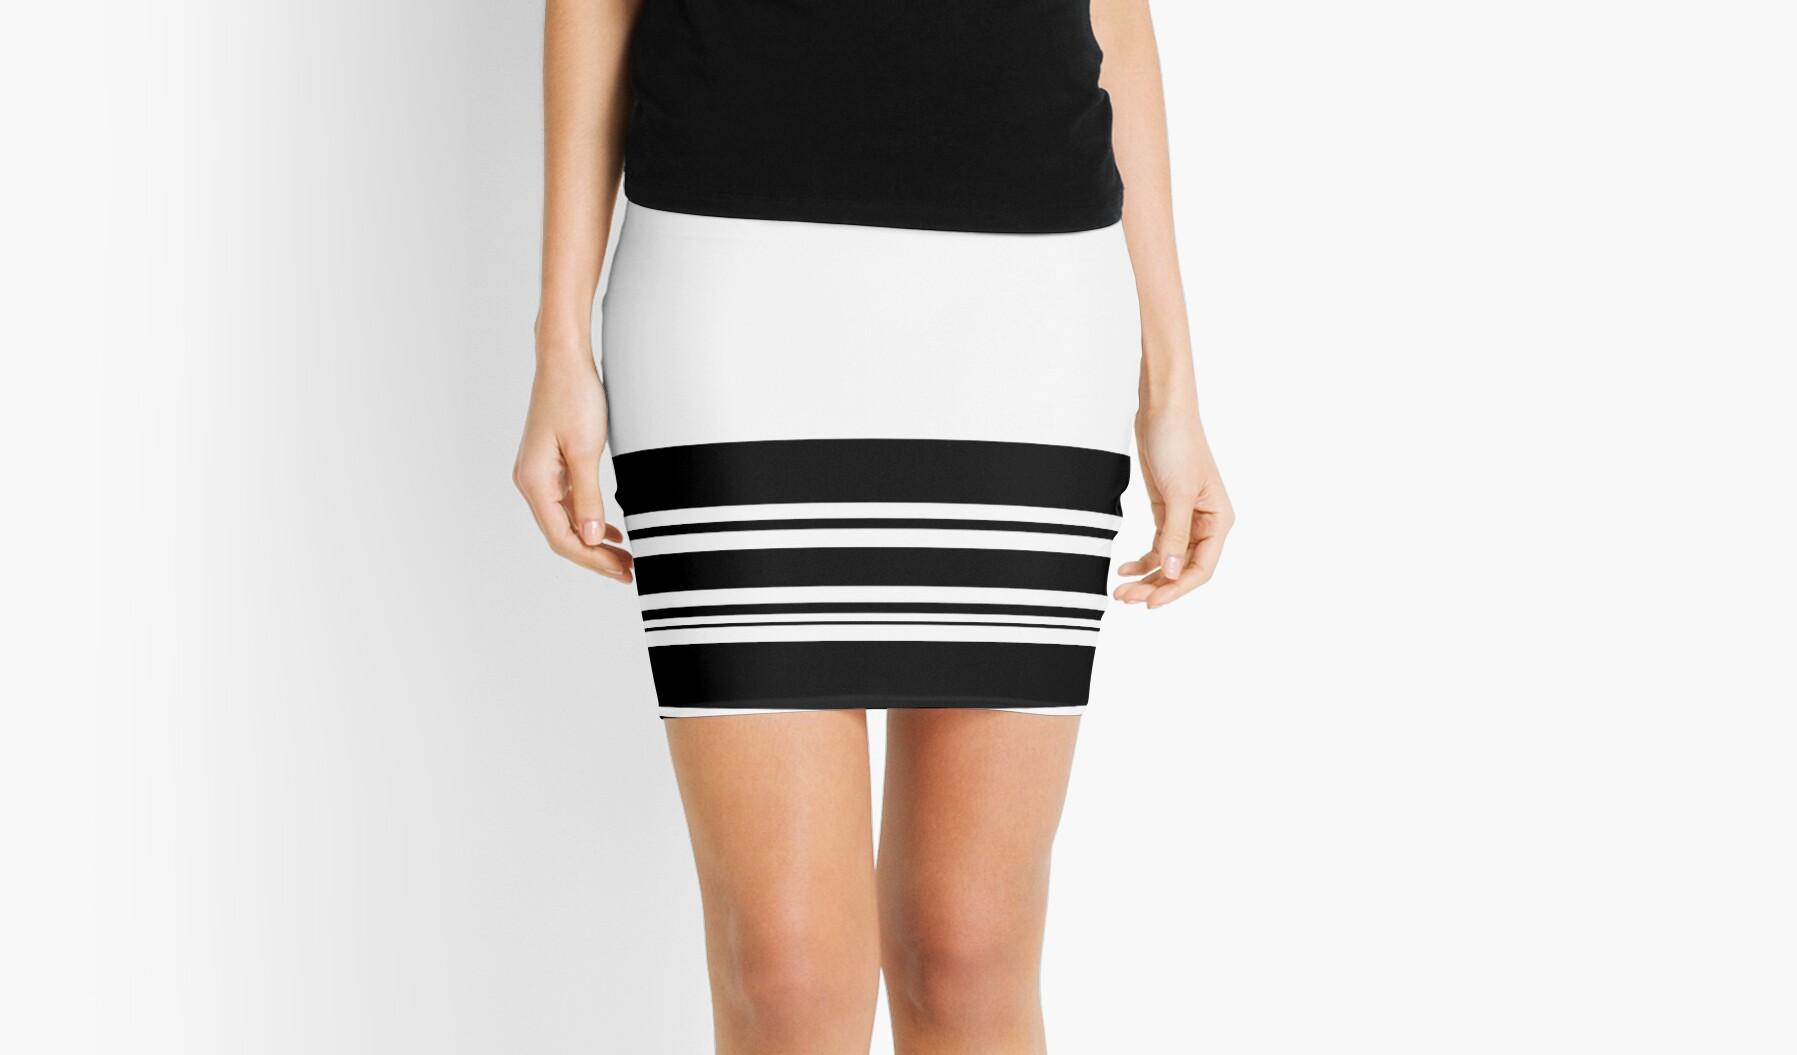 Black and White Modern Stripes by Melissa Park